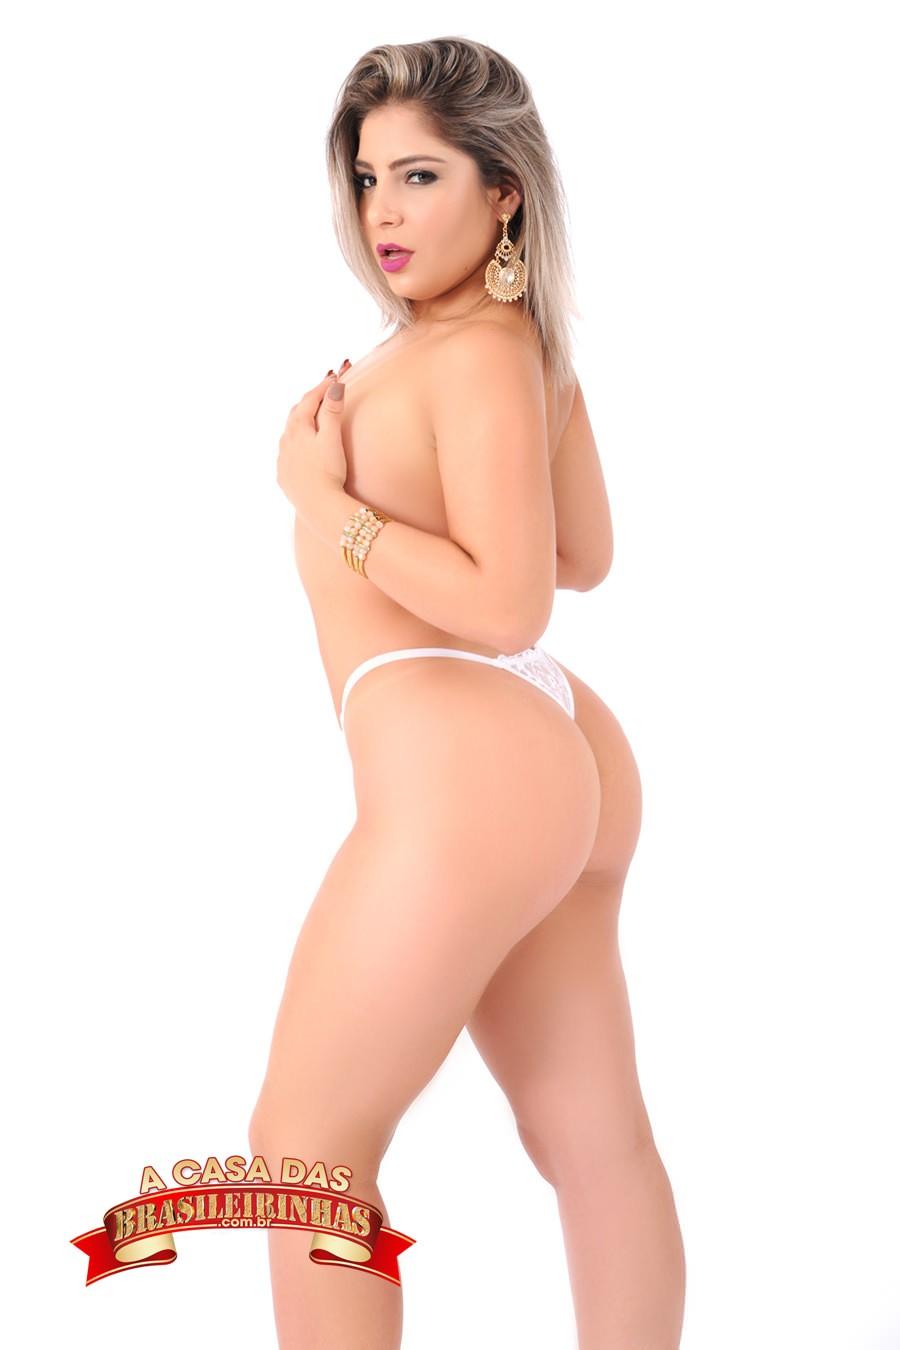 foto-da-atriz-pornô-Nina-Lins.jpg